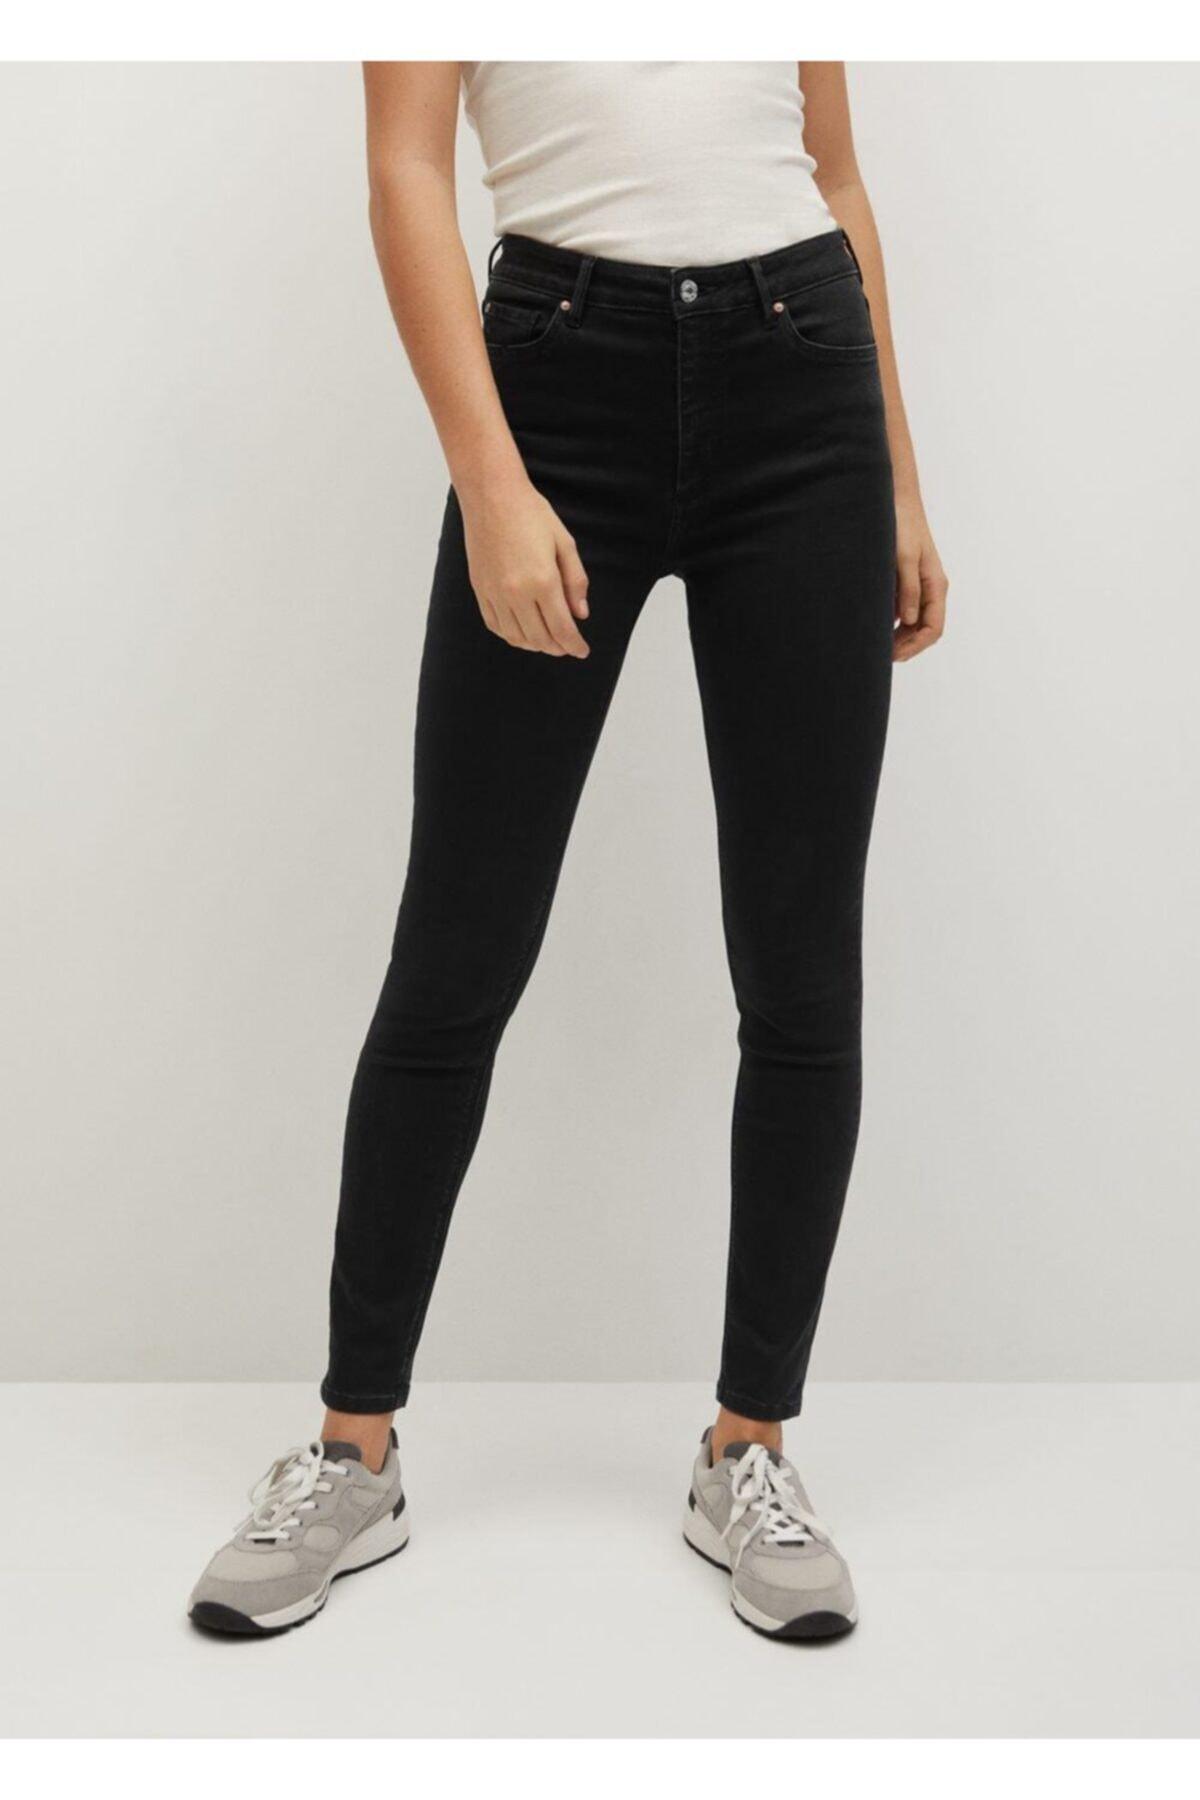 MANGO Woman Noa Yüksek Bel Skinny Jean Pantolon 1